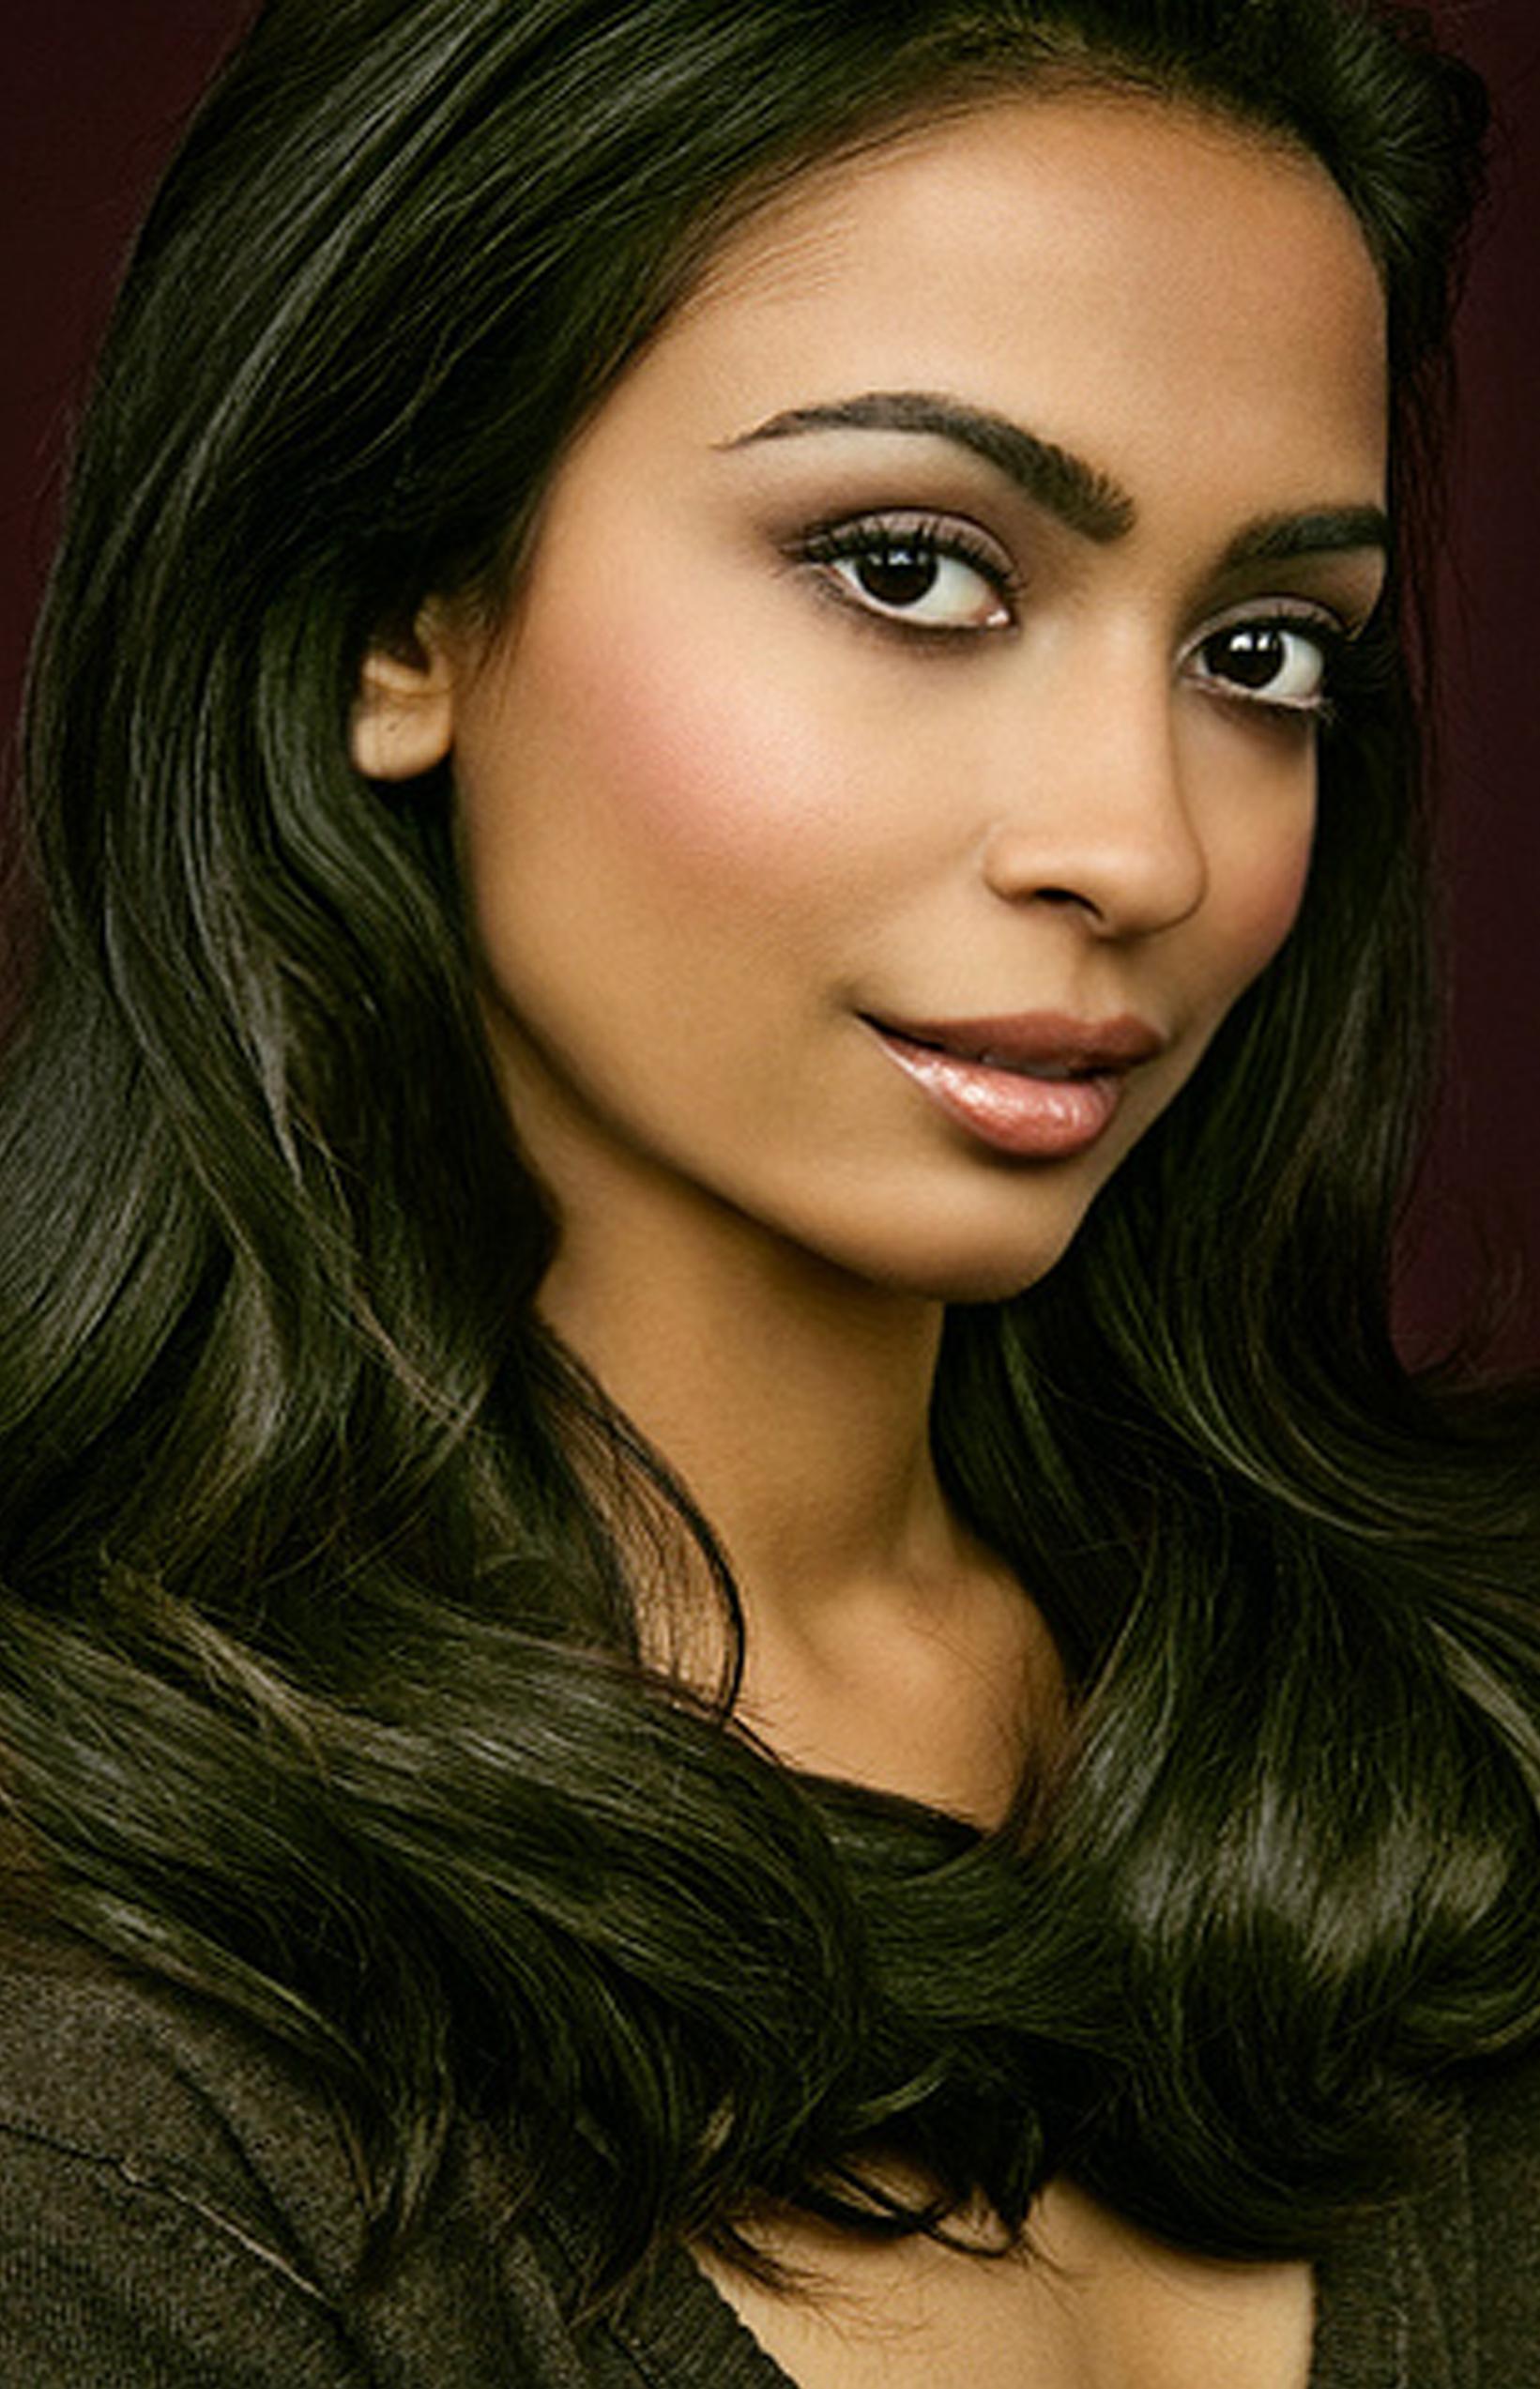 Olive/medium skin tone makeup Medium skin tone makeup